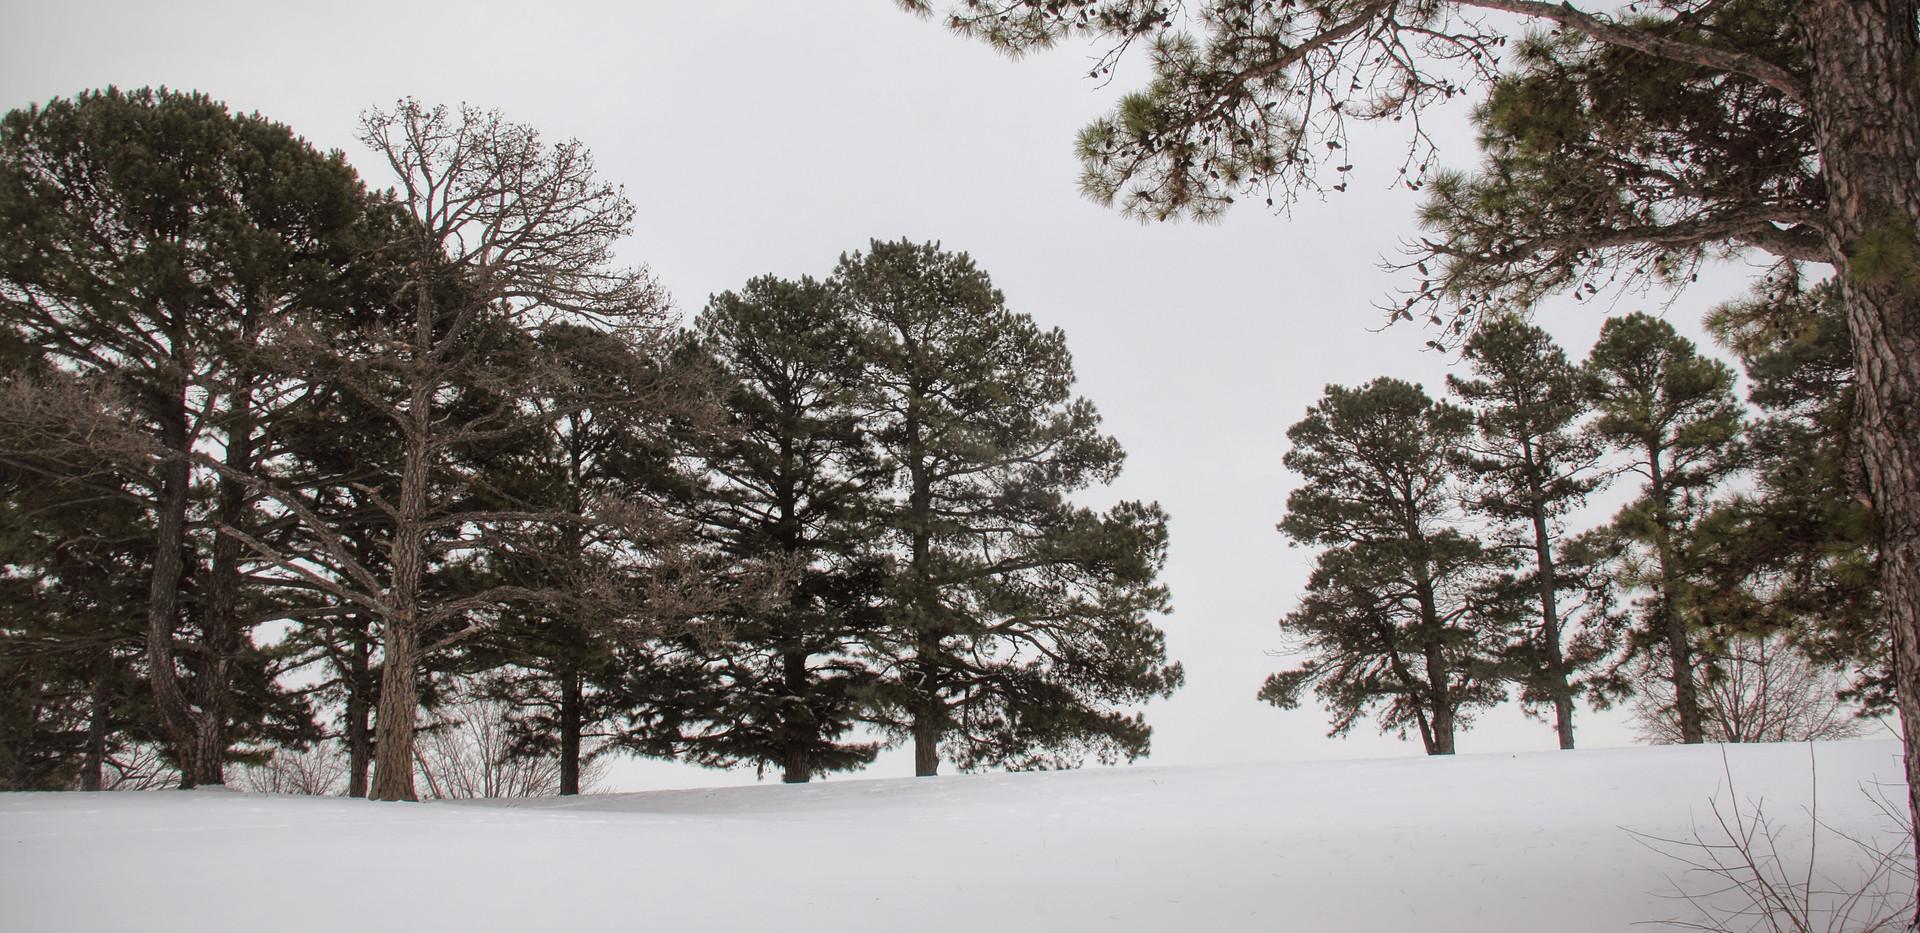 A_Golf_Snow_01.jpg